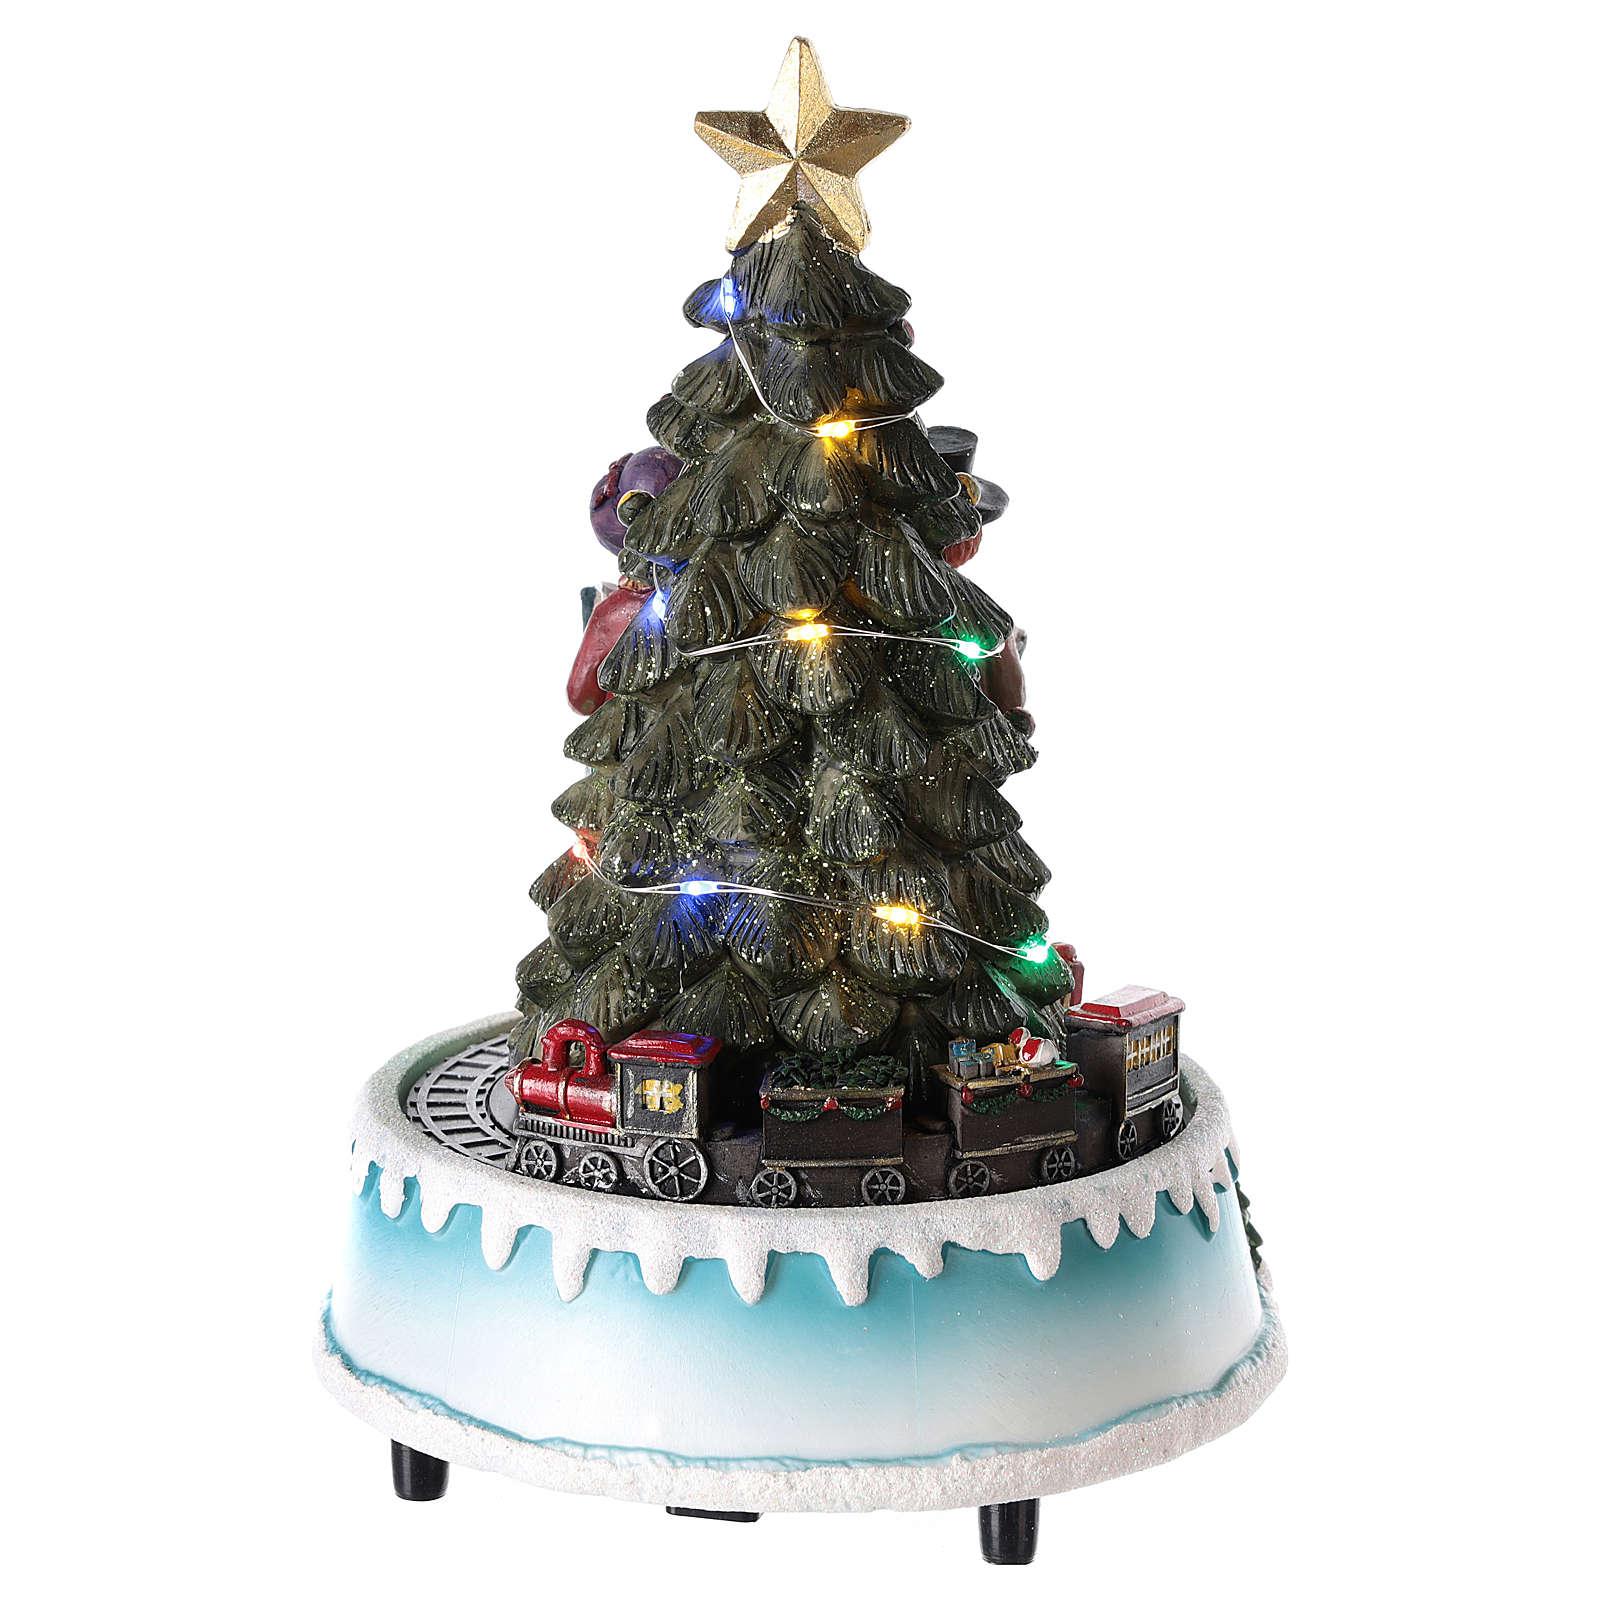 Sapin de Noël avec choeur 15x20 cm 3